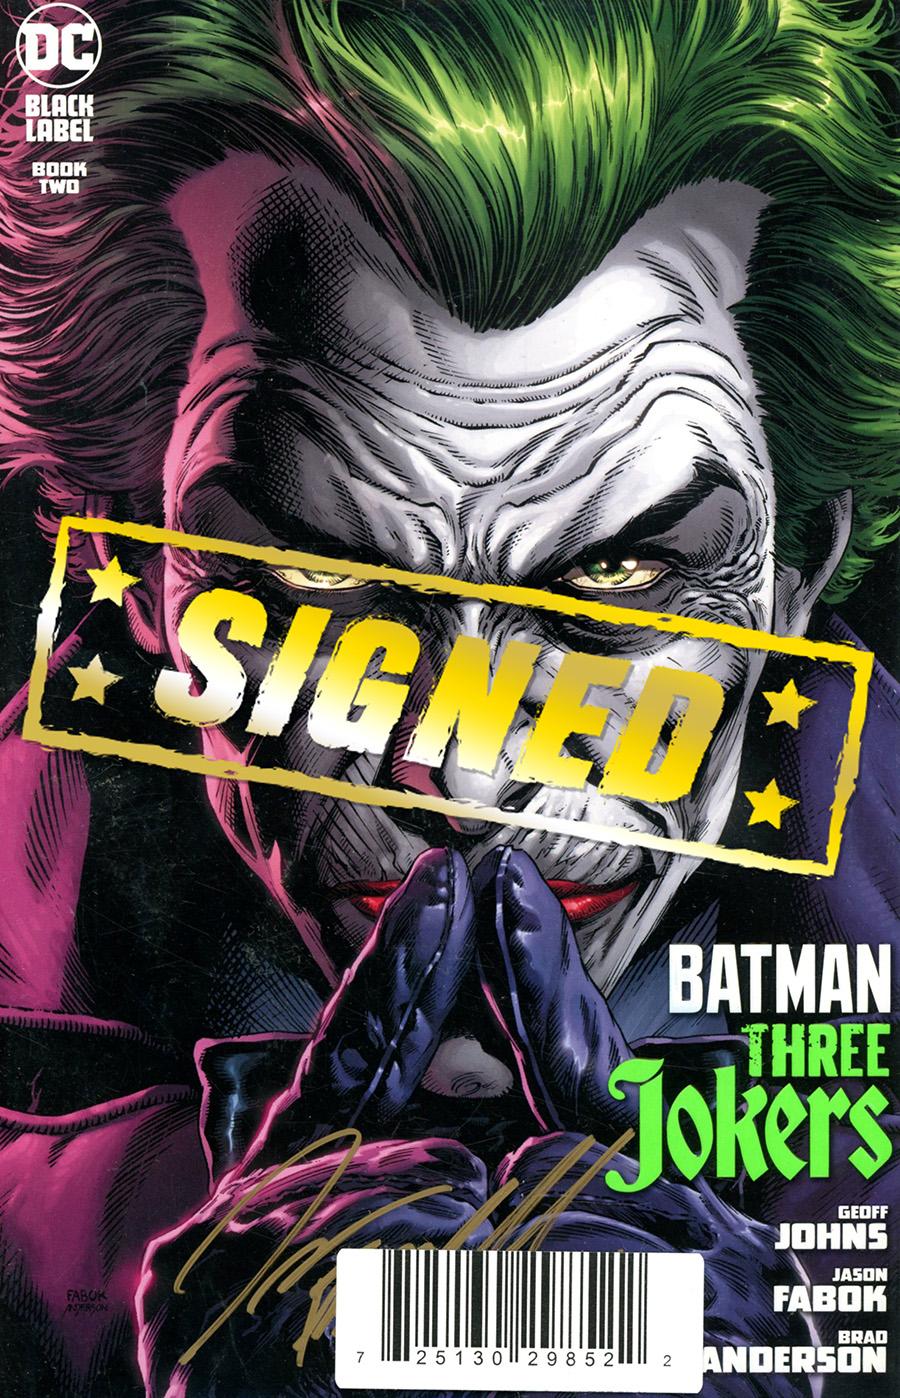 Batman Three Jokers #2 Cover F DF Signed By Jason Fabok